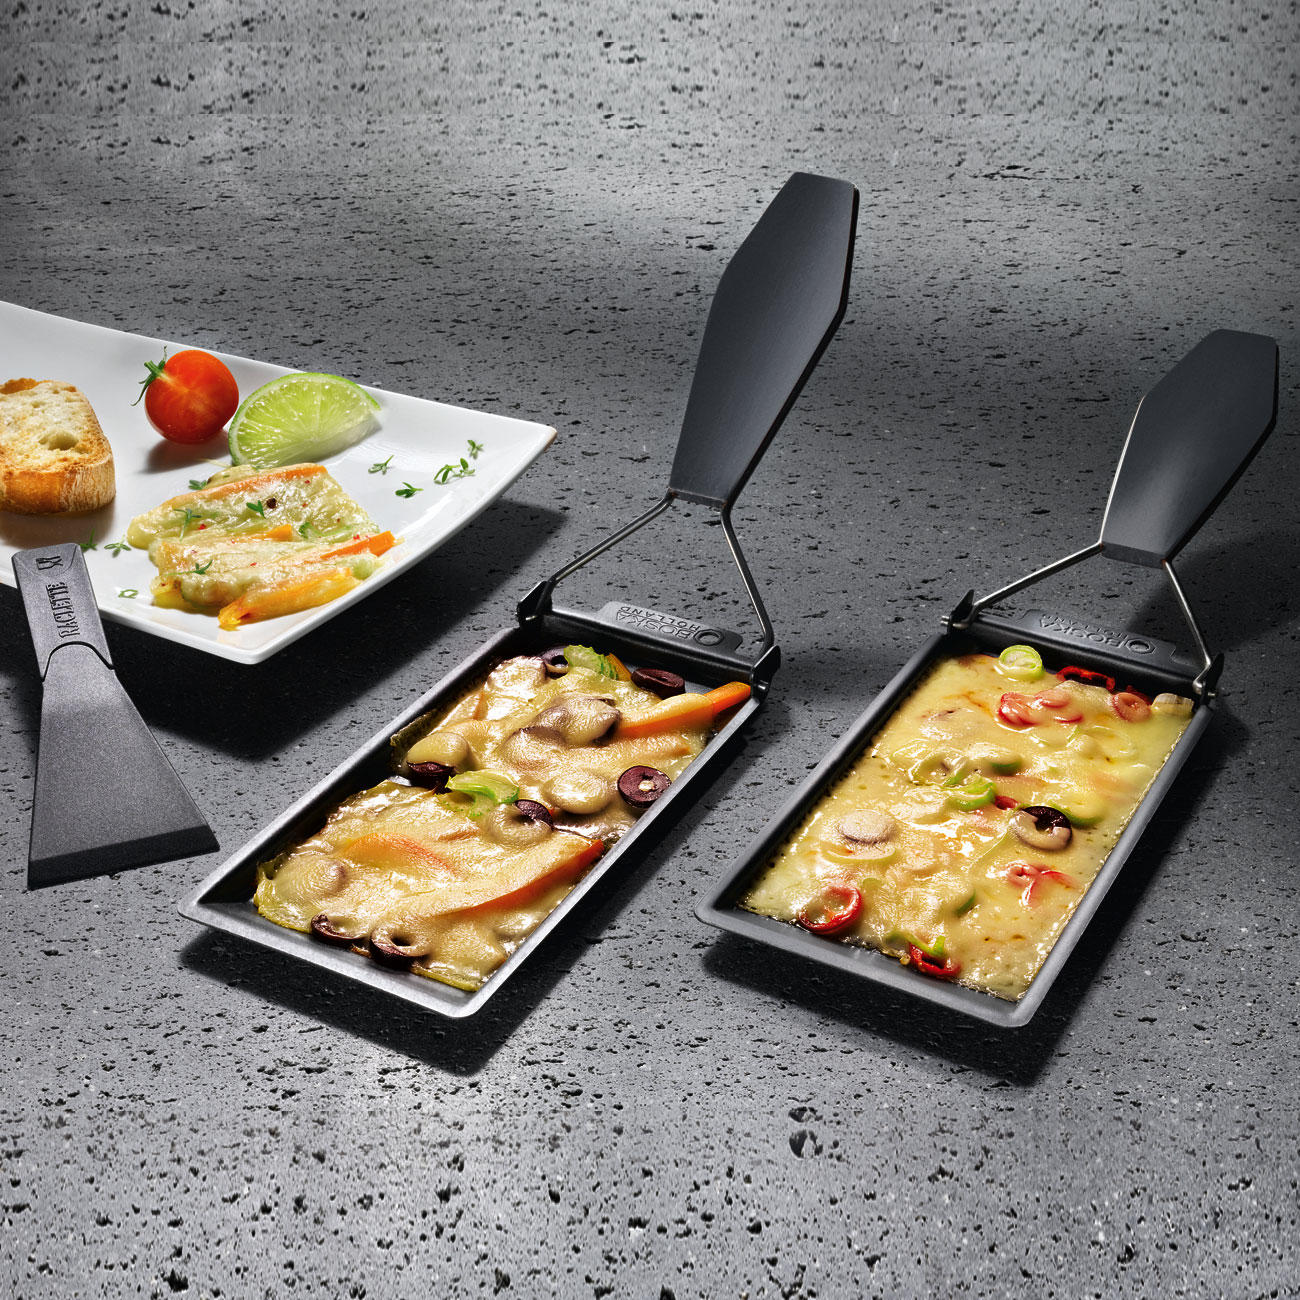 preisvergleich eu raclette und grill. Black Bedroom Furniture Sets. Home Design Ideas